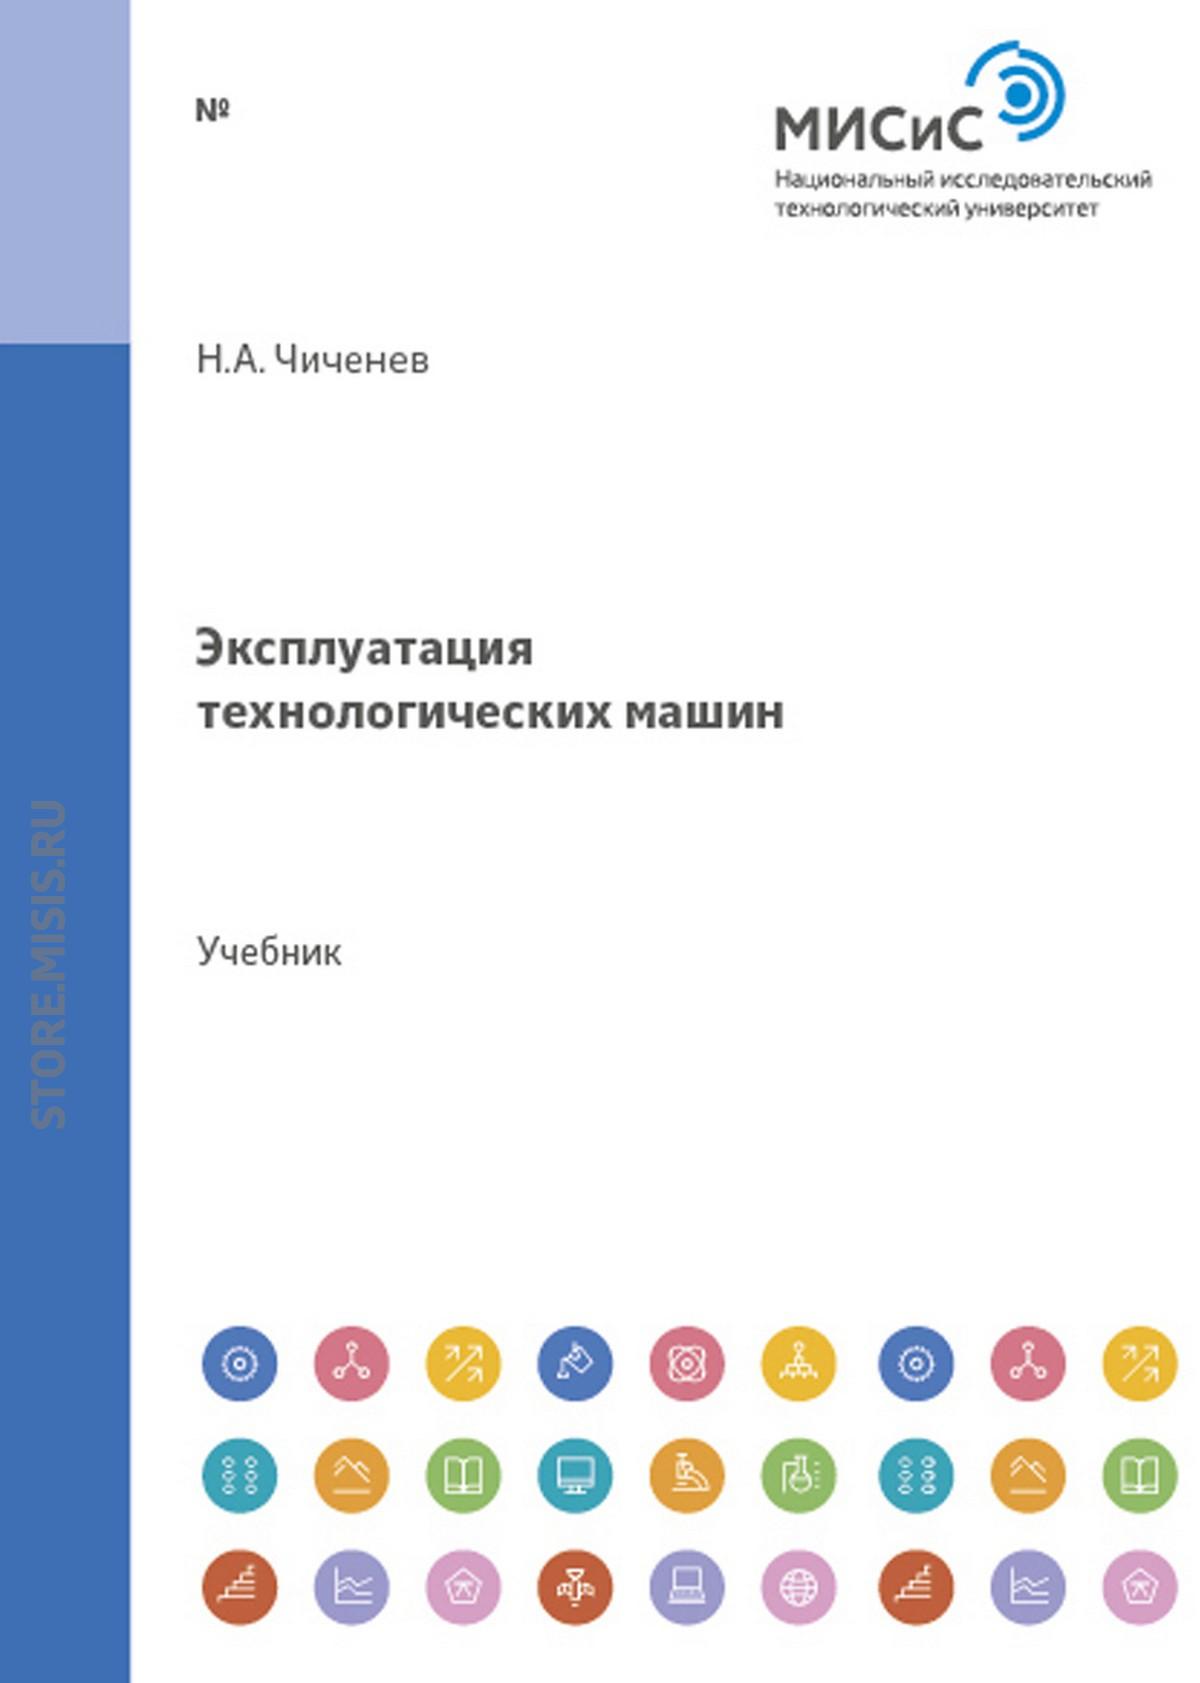 Н. А. Чиченев Эксплуатация технологических машин николай чиченев эксплуатация технологического оборудования